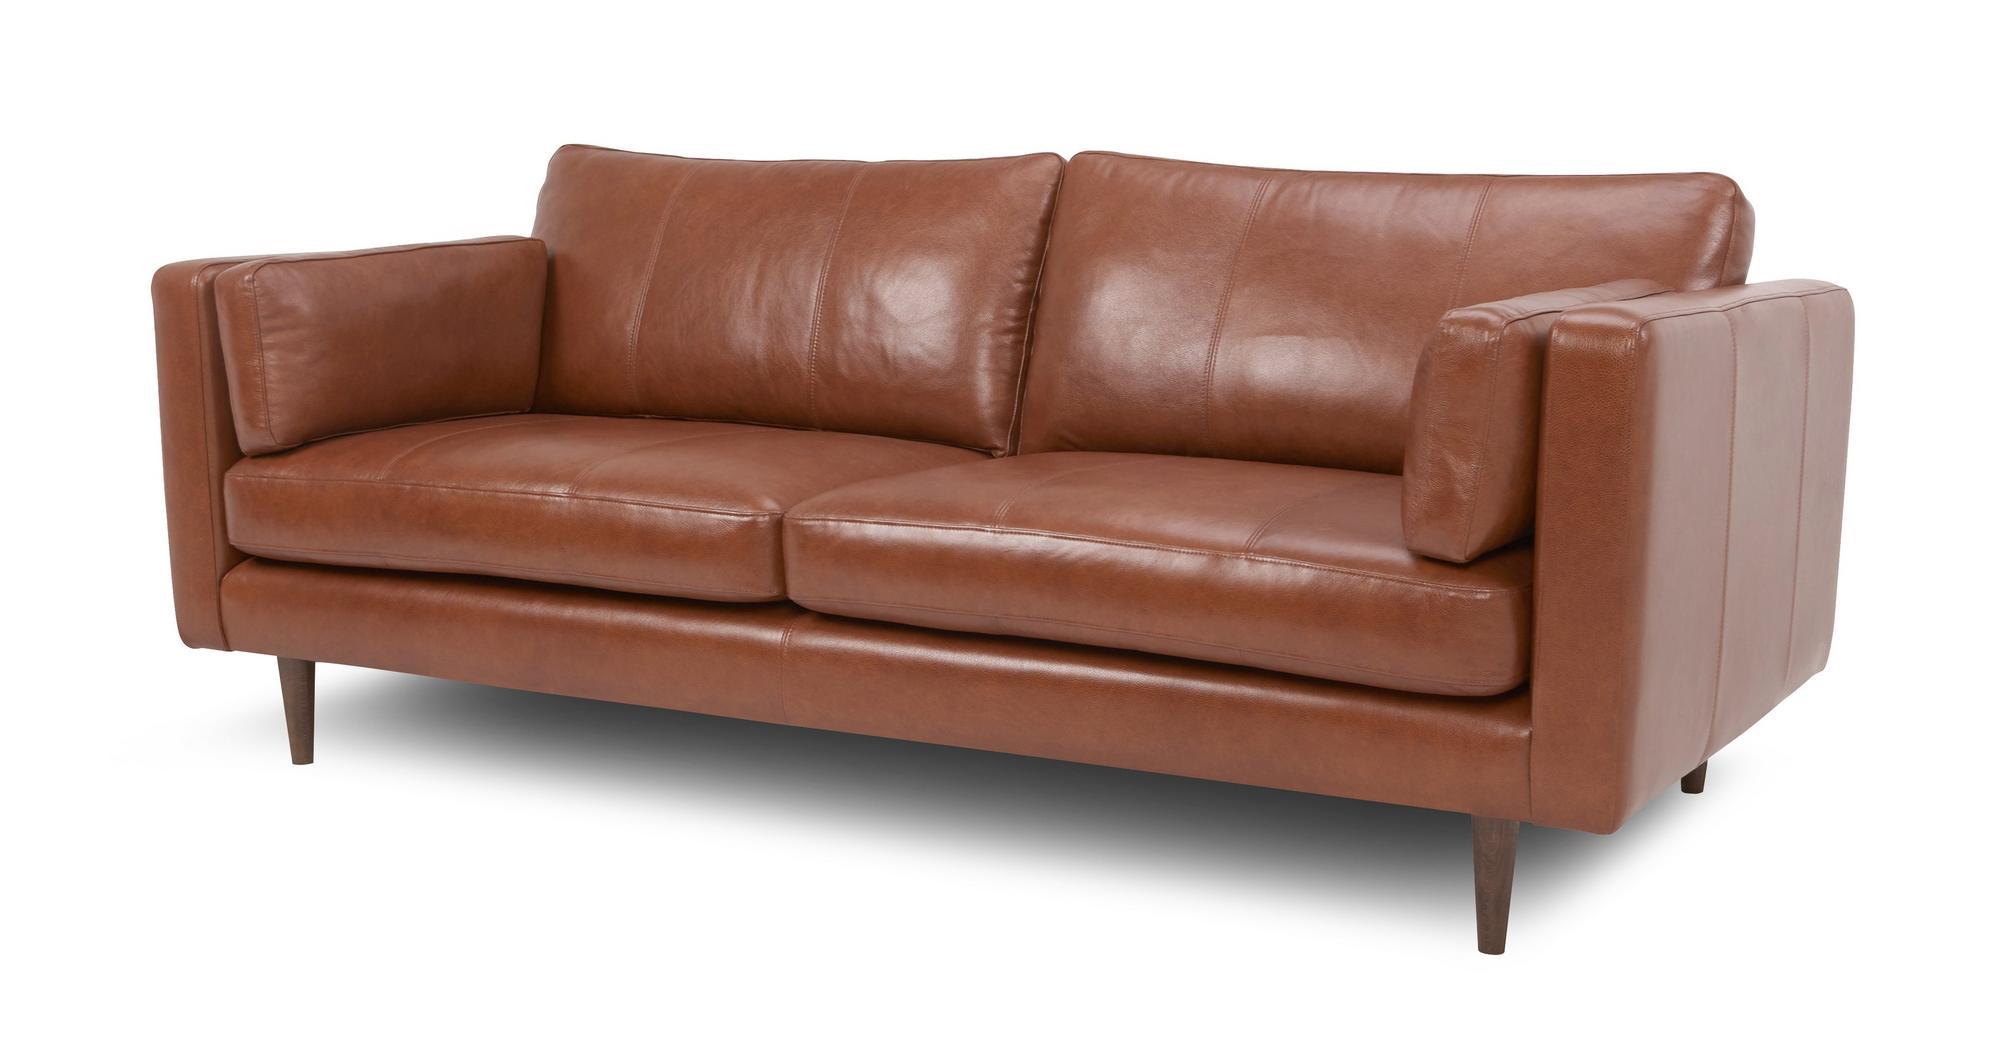 Dfs Marl Tan 100 Leather Large Sofa Small Sofa Cuddler